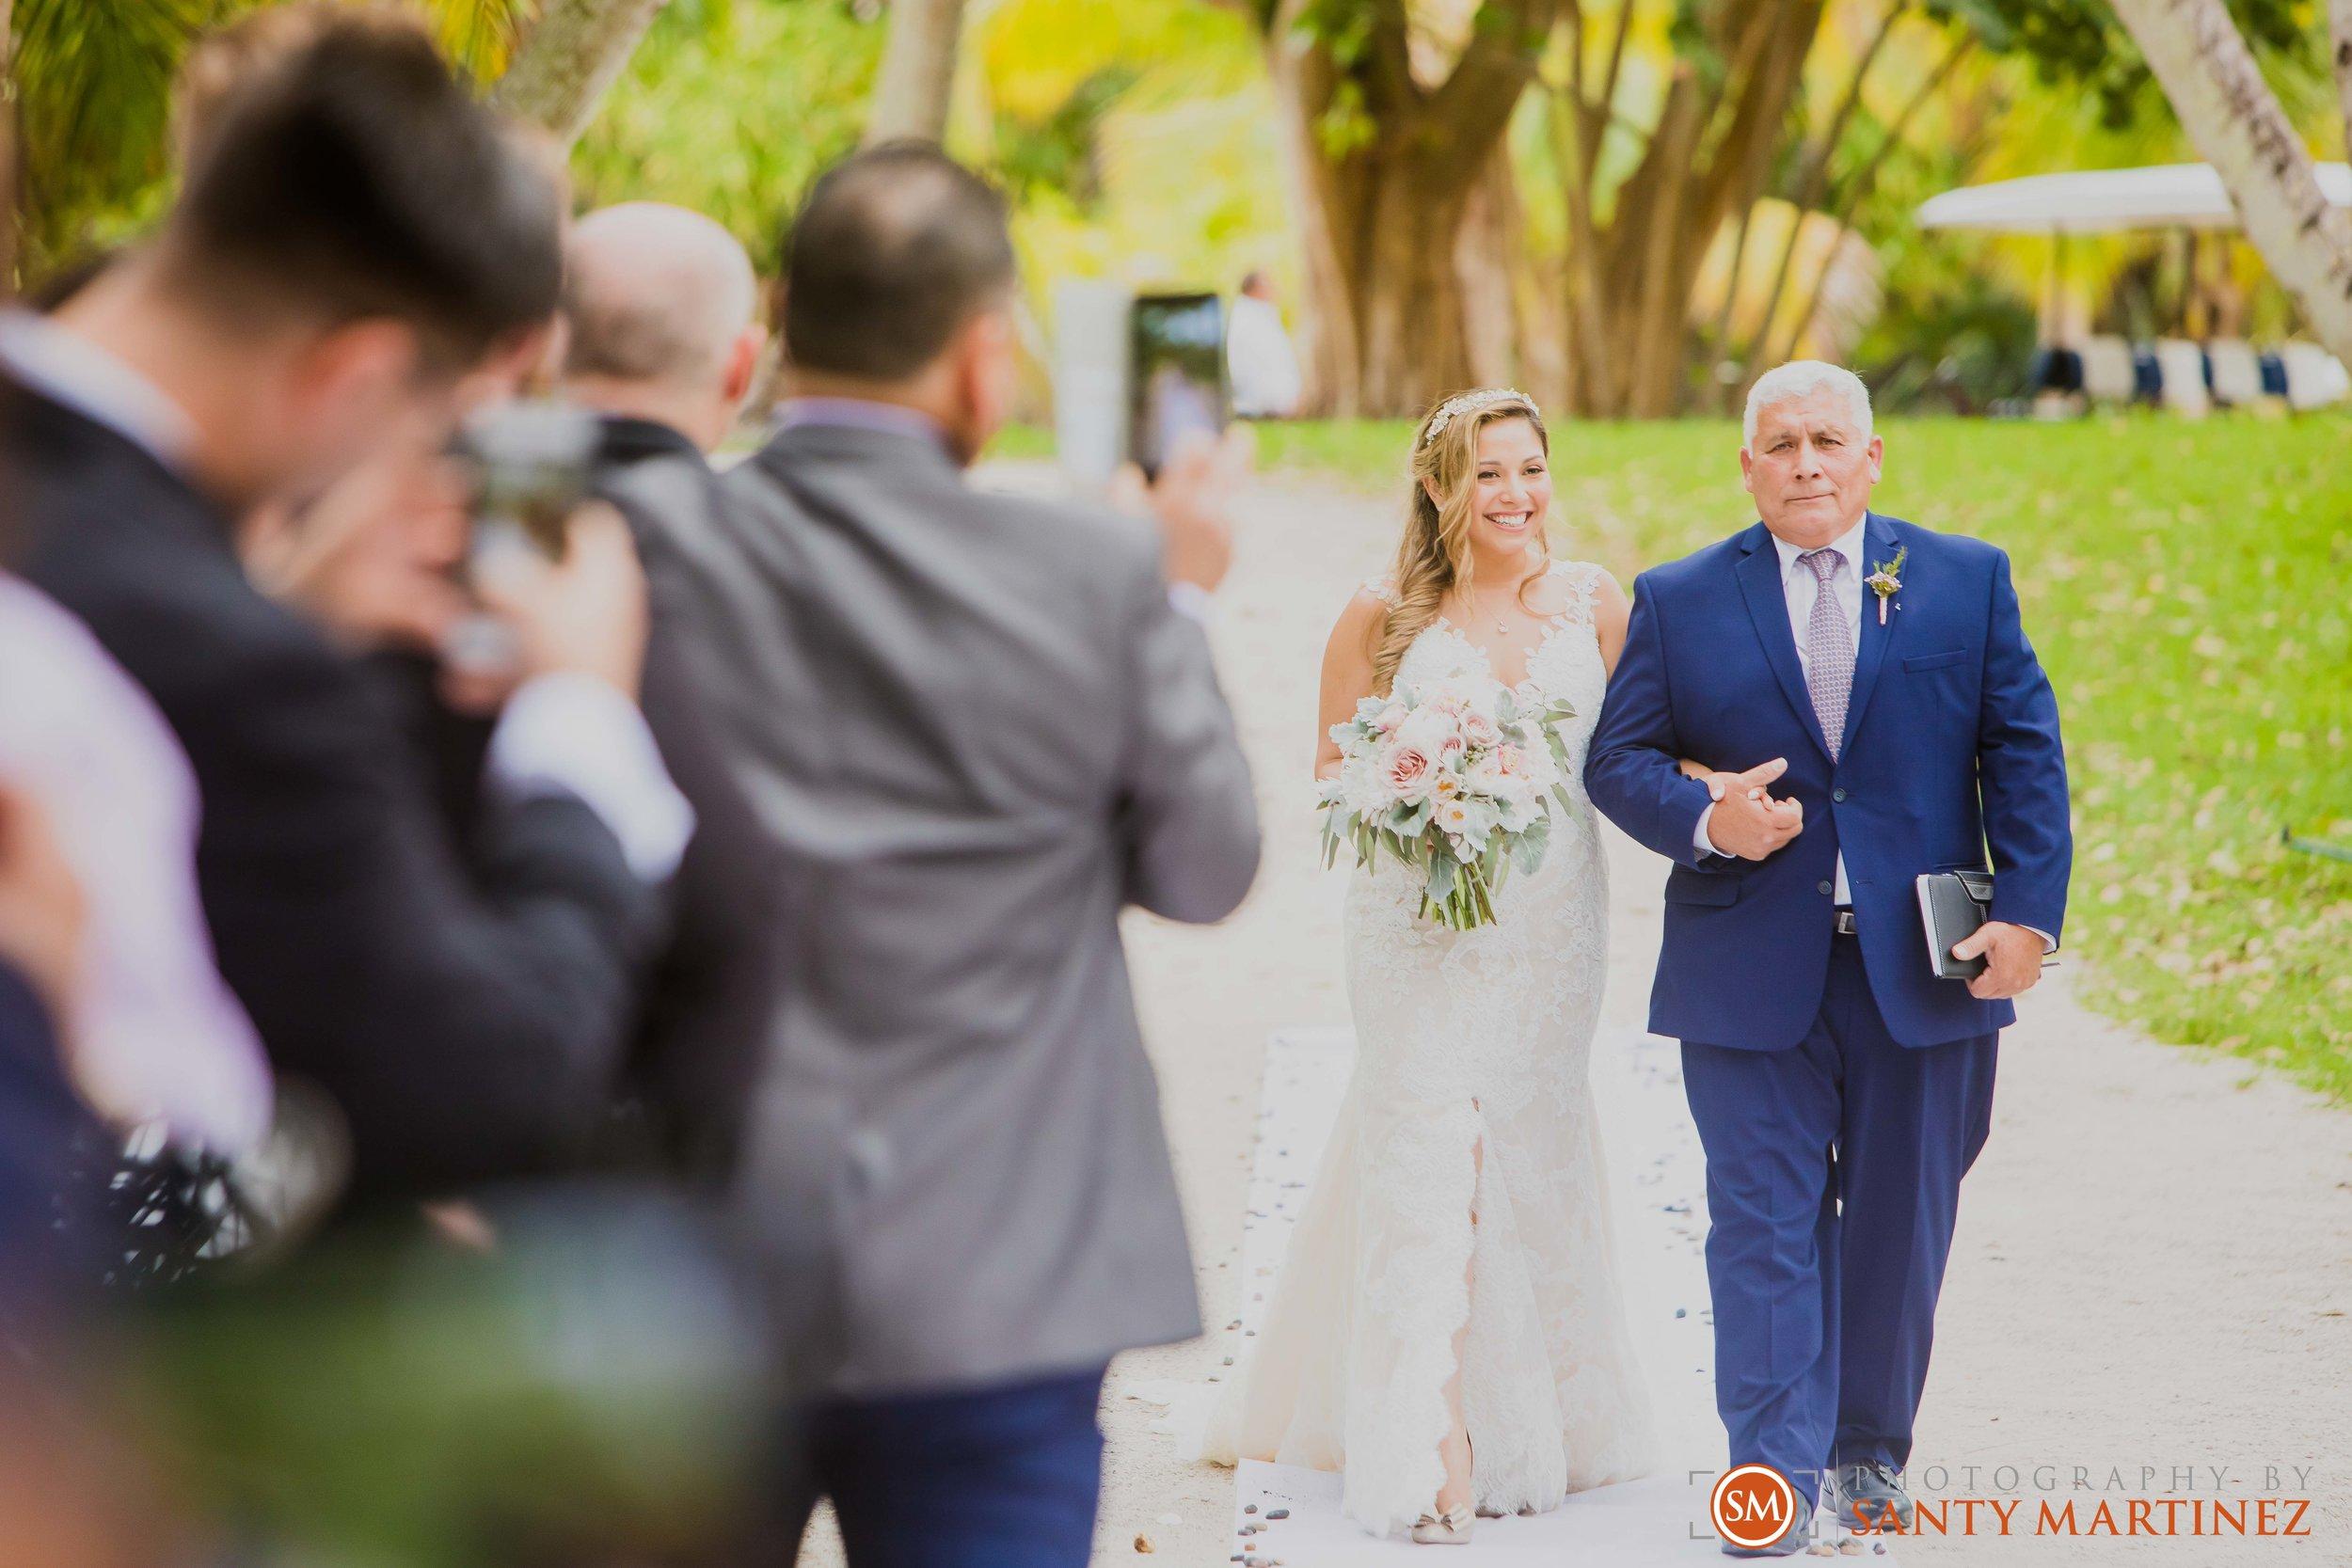 Wedding Bonnet House - Santy Martinez Photography-29.jpg